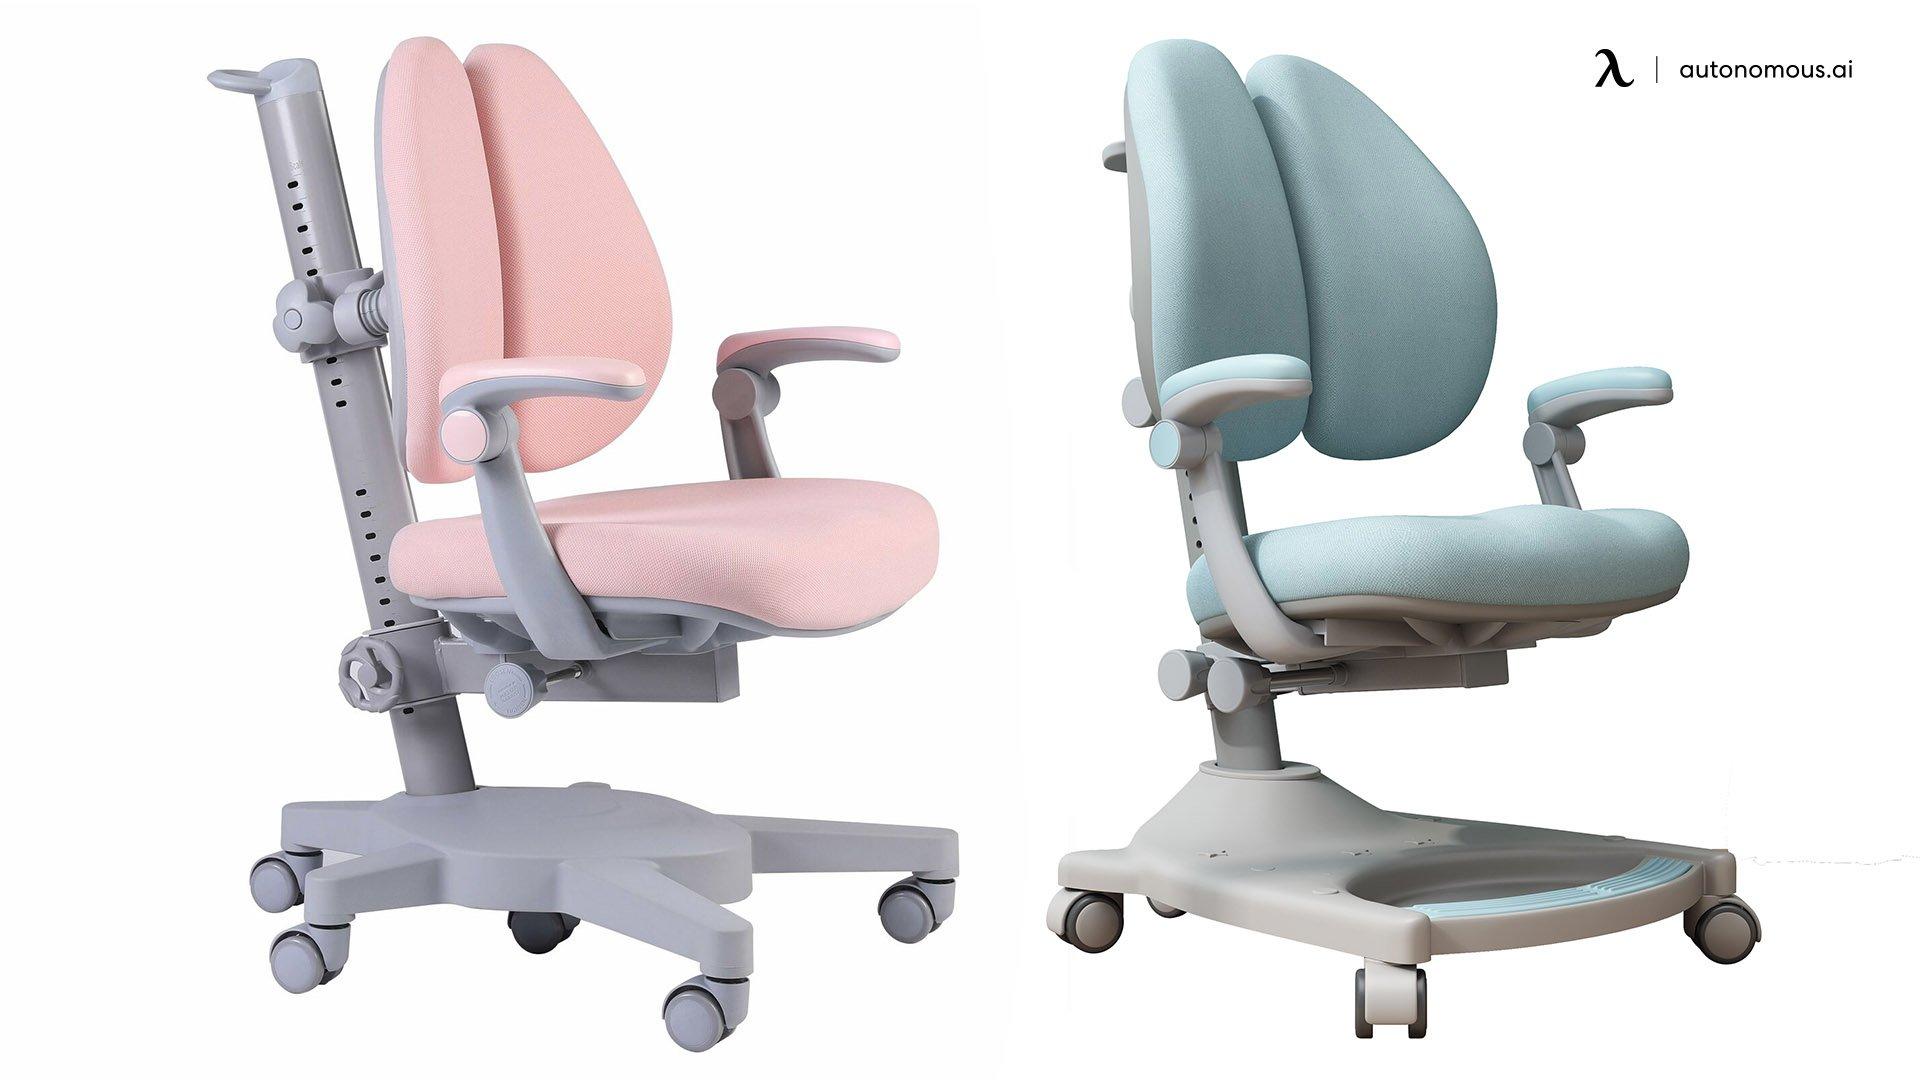 QualiSky Child's Ergonomic Adjustable Study Desk Chair